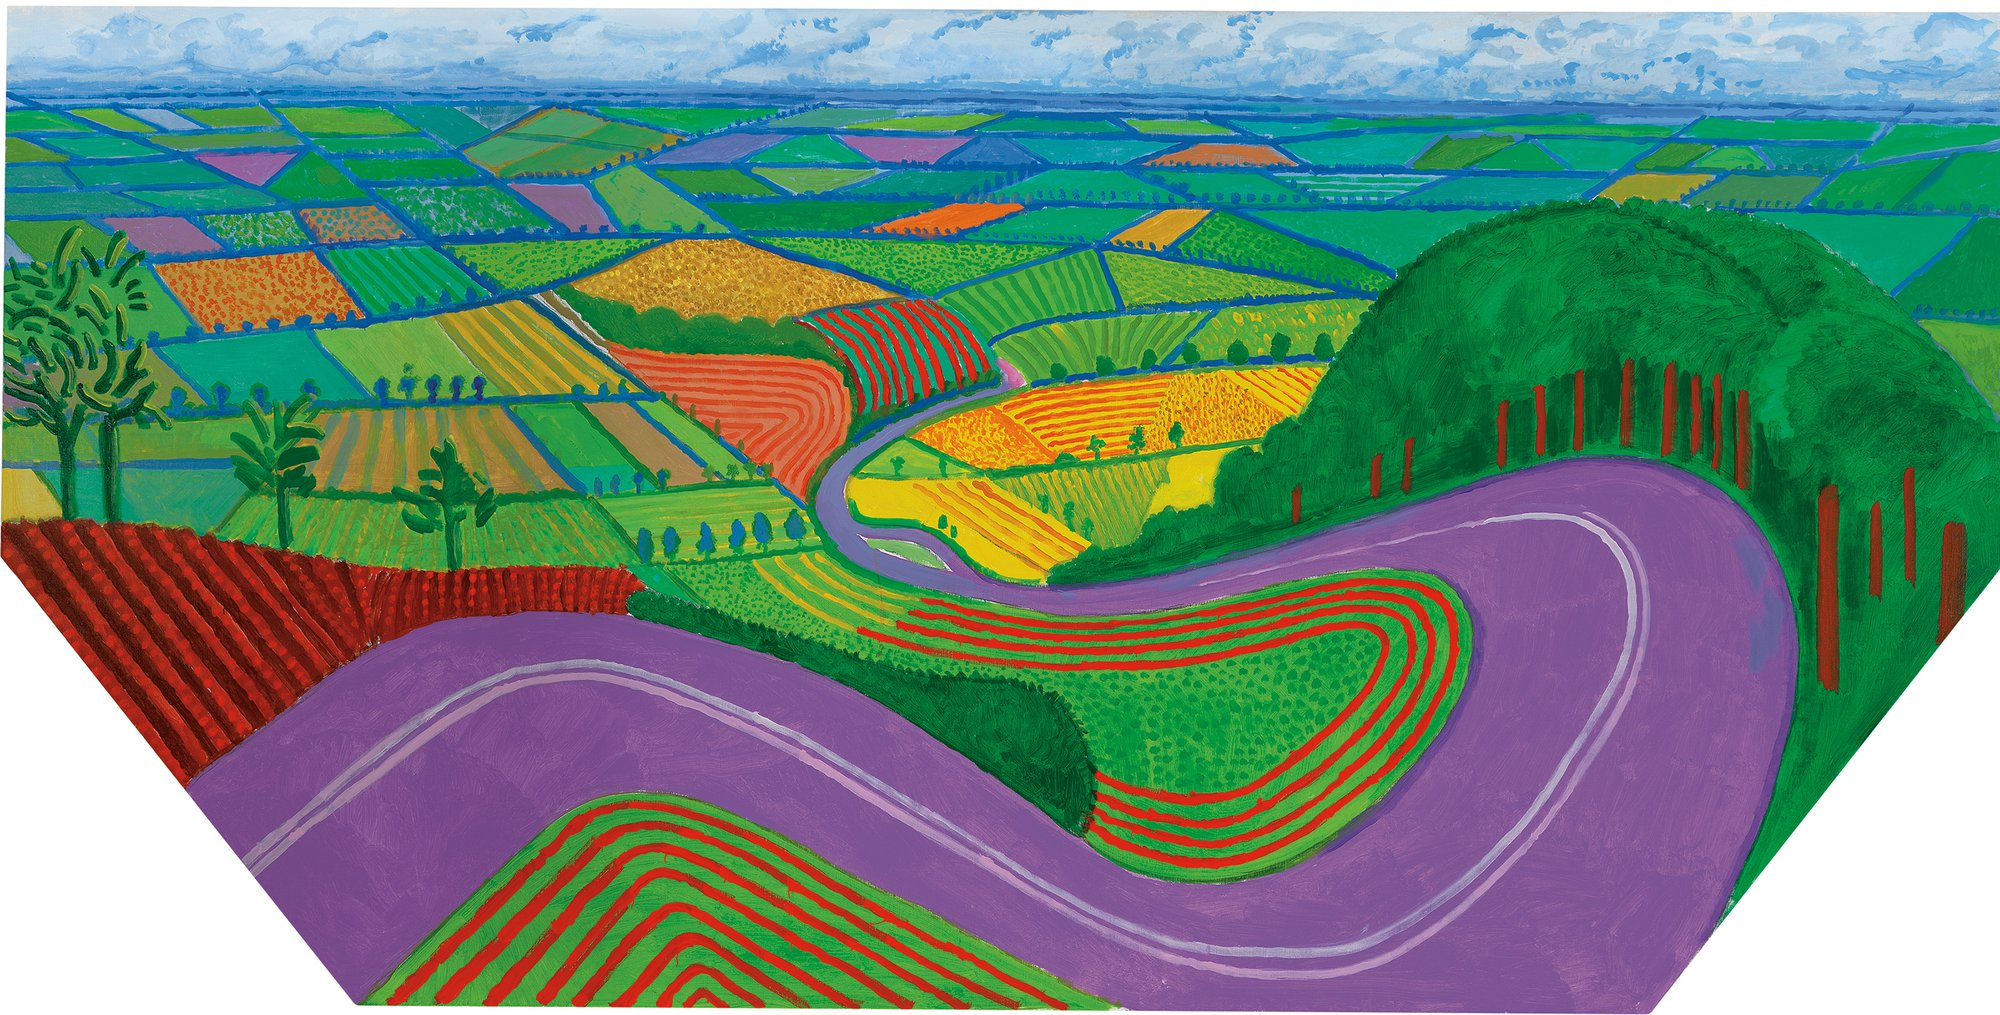 David Hockney | Pace Gallery